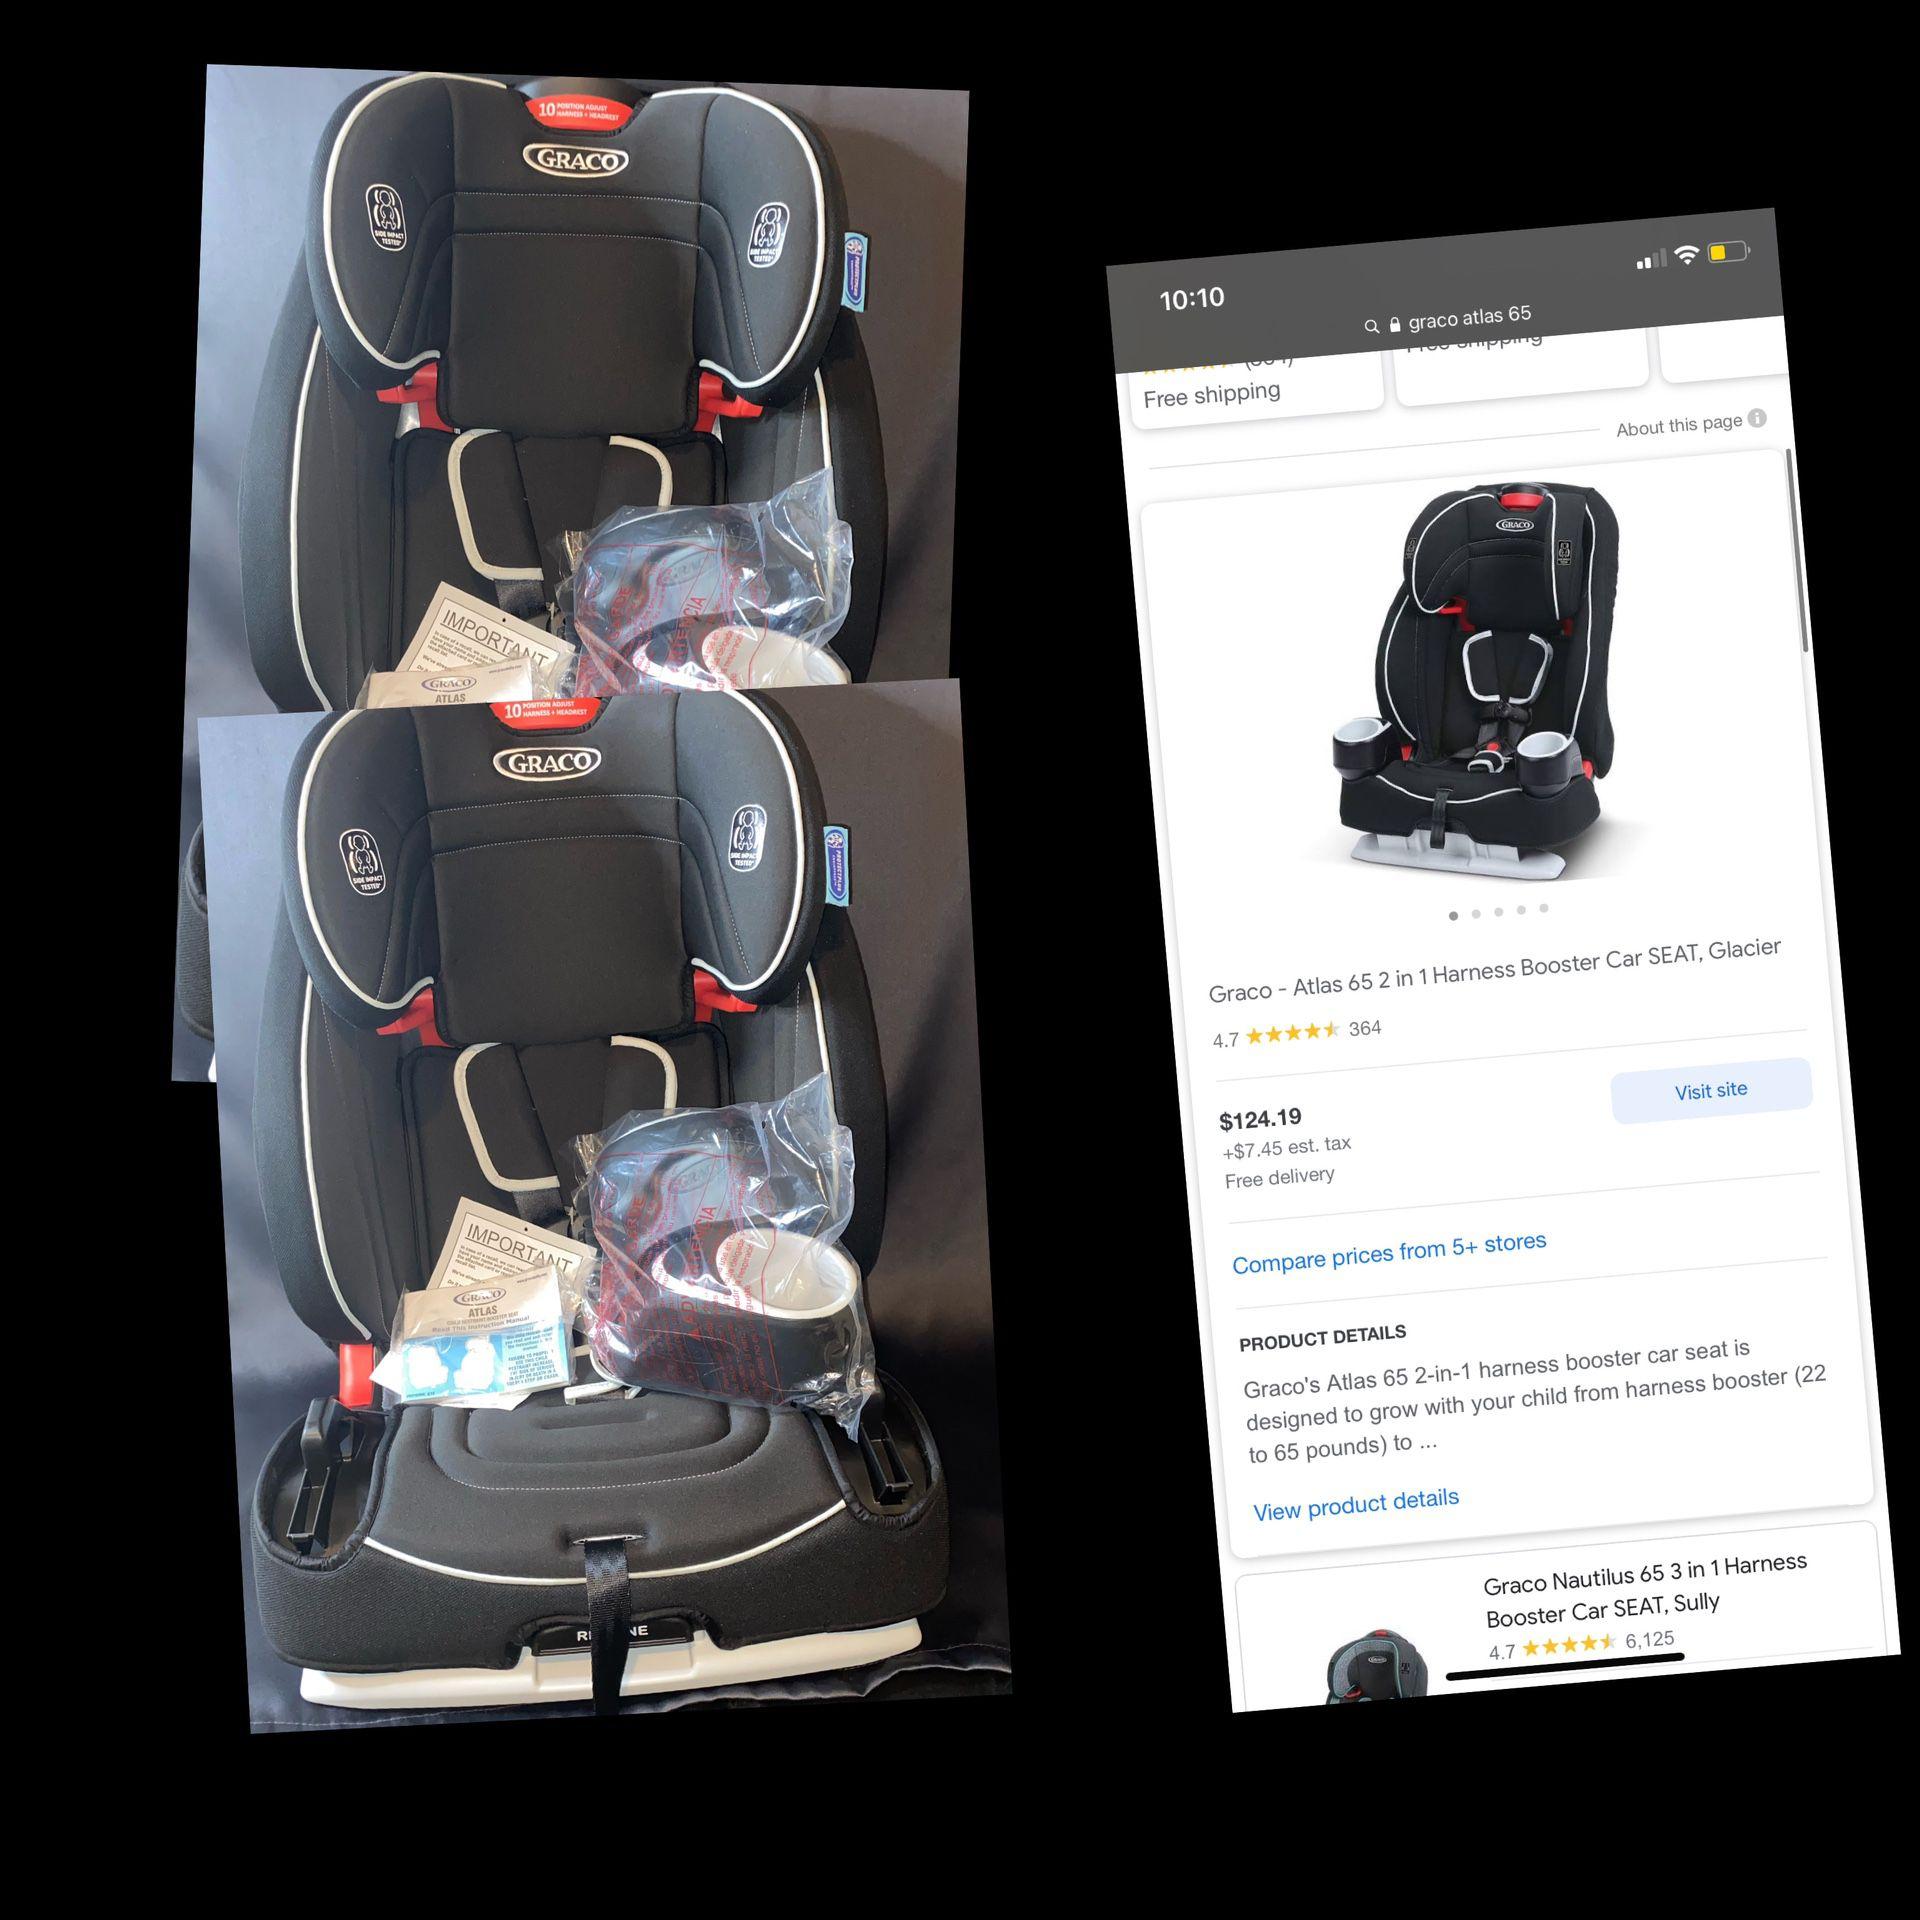 Graco Atlas 65 (Car Seat)